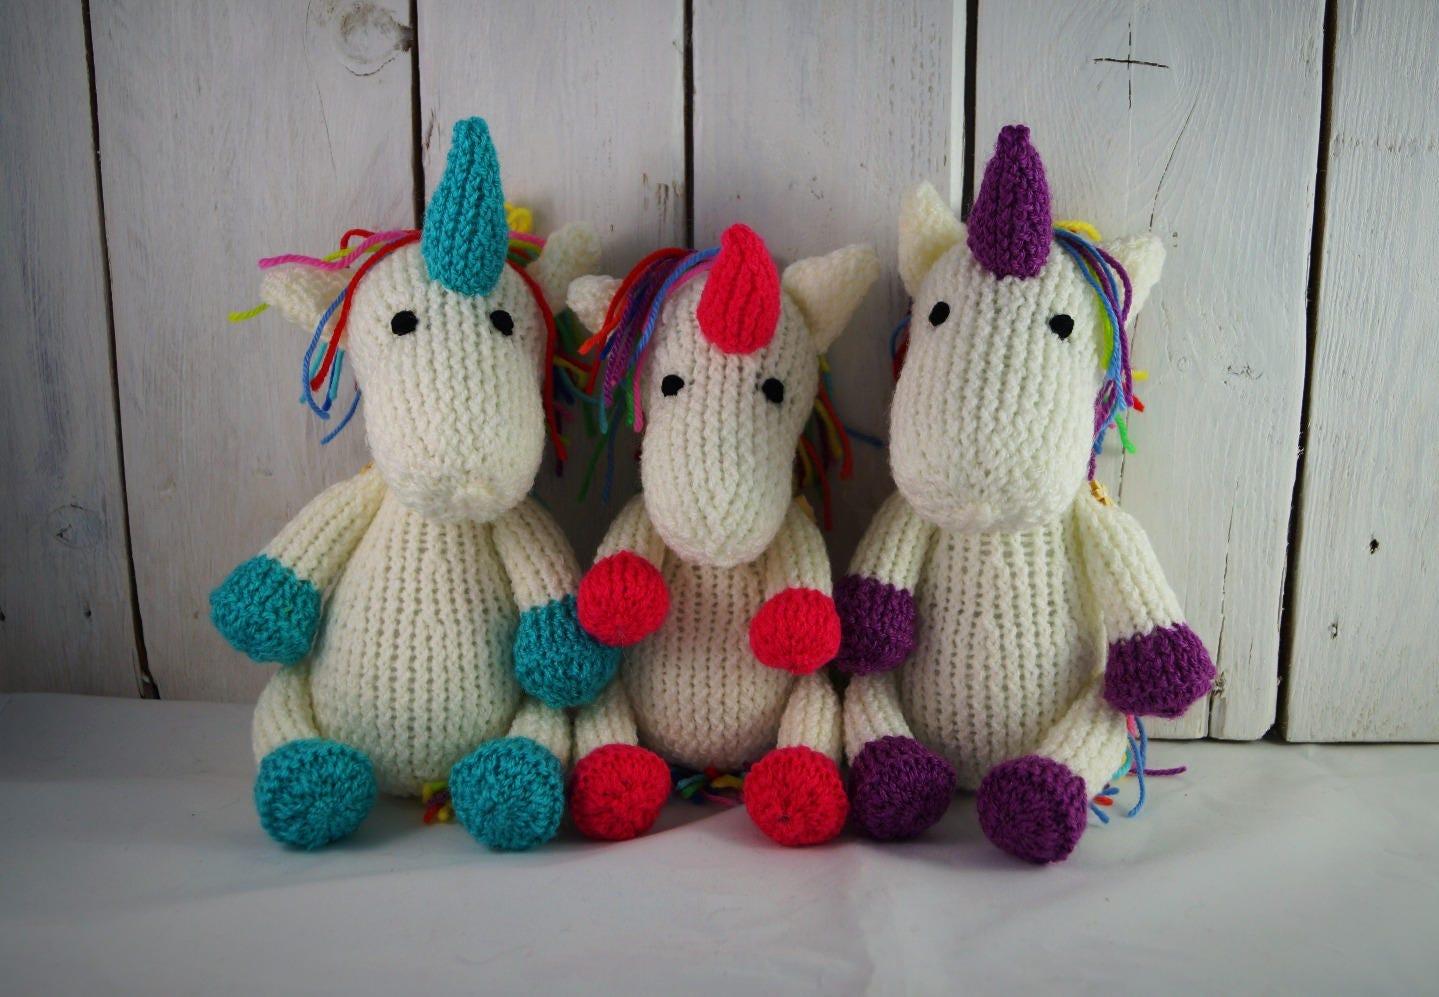 Unicorn hand knit knitted horse teddy soft toy cuddly photo prop gift baby shower stuffed animal nursery decor Waldorf toy crochet birthday